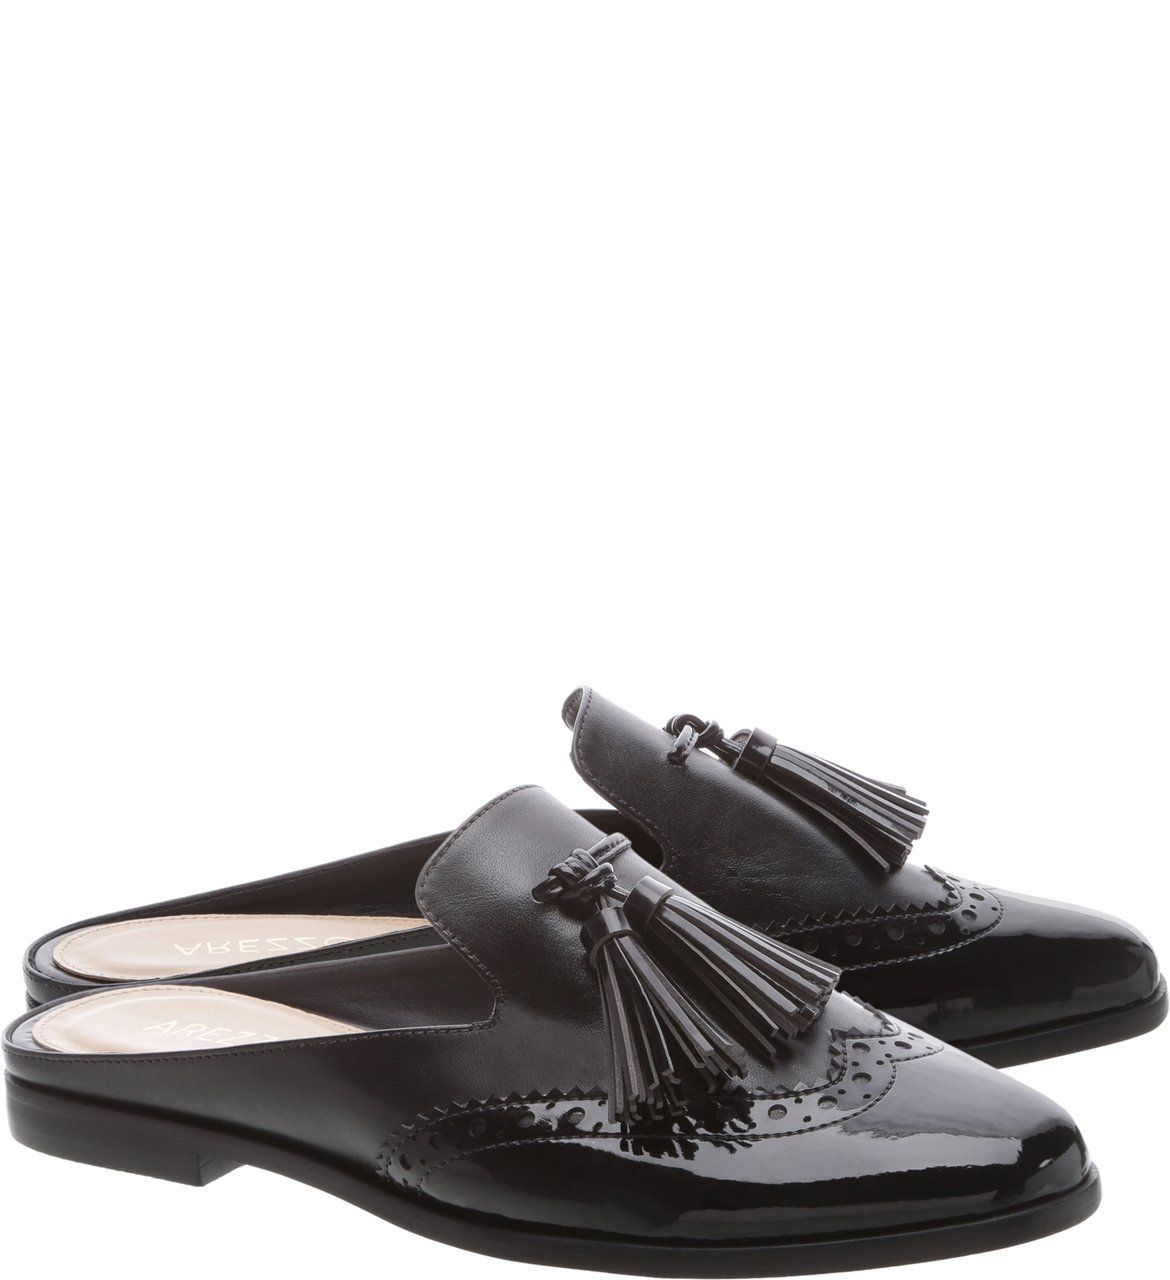 a70594084 Mule Barbicachos Preto   Arezzo   Closet em 2019   Oxford shoes ...